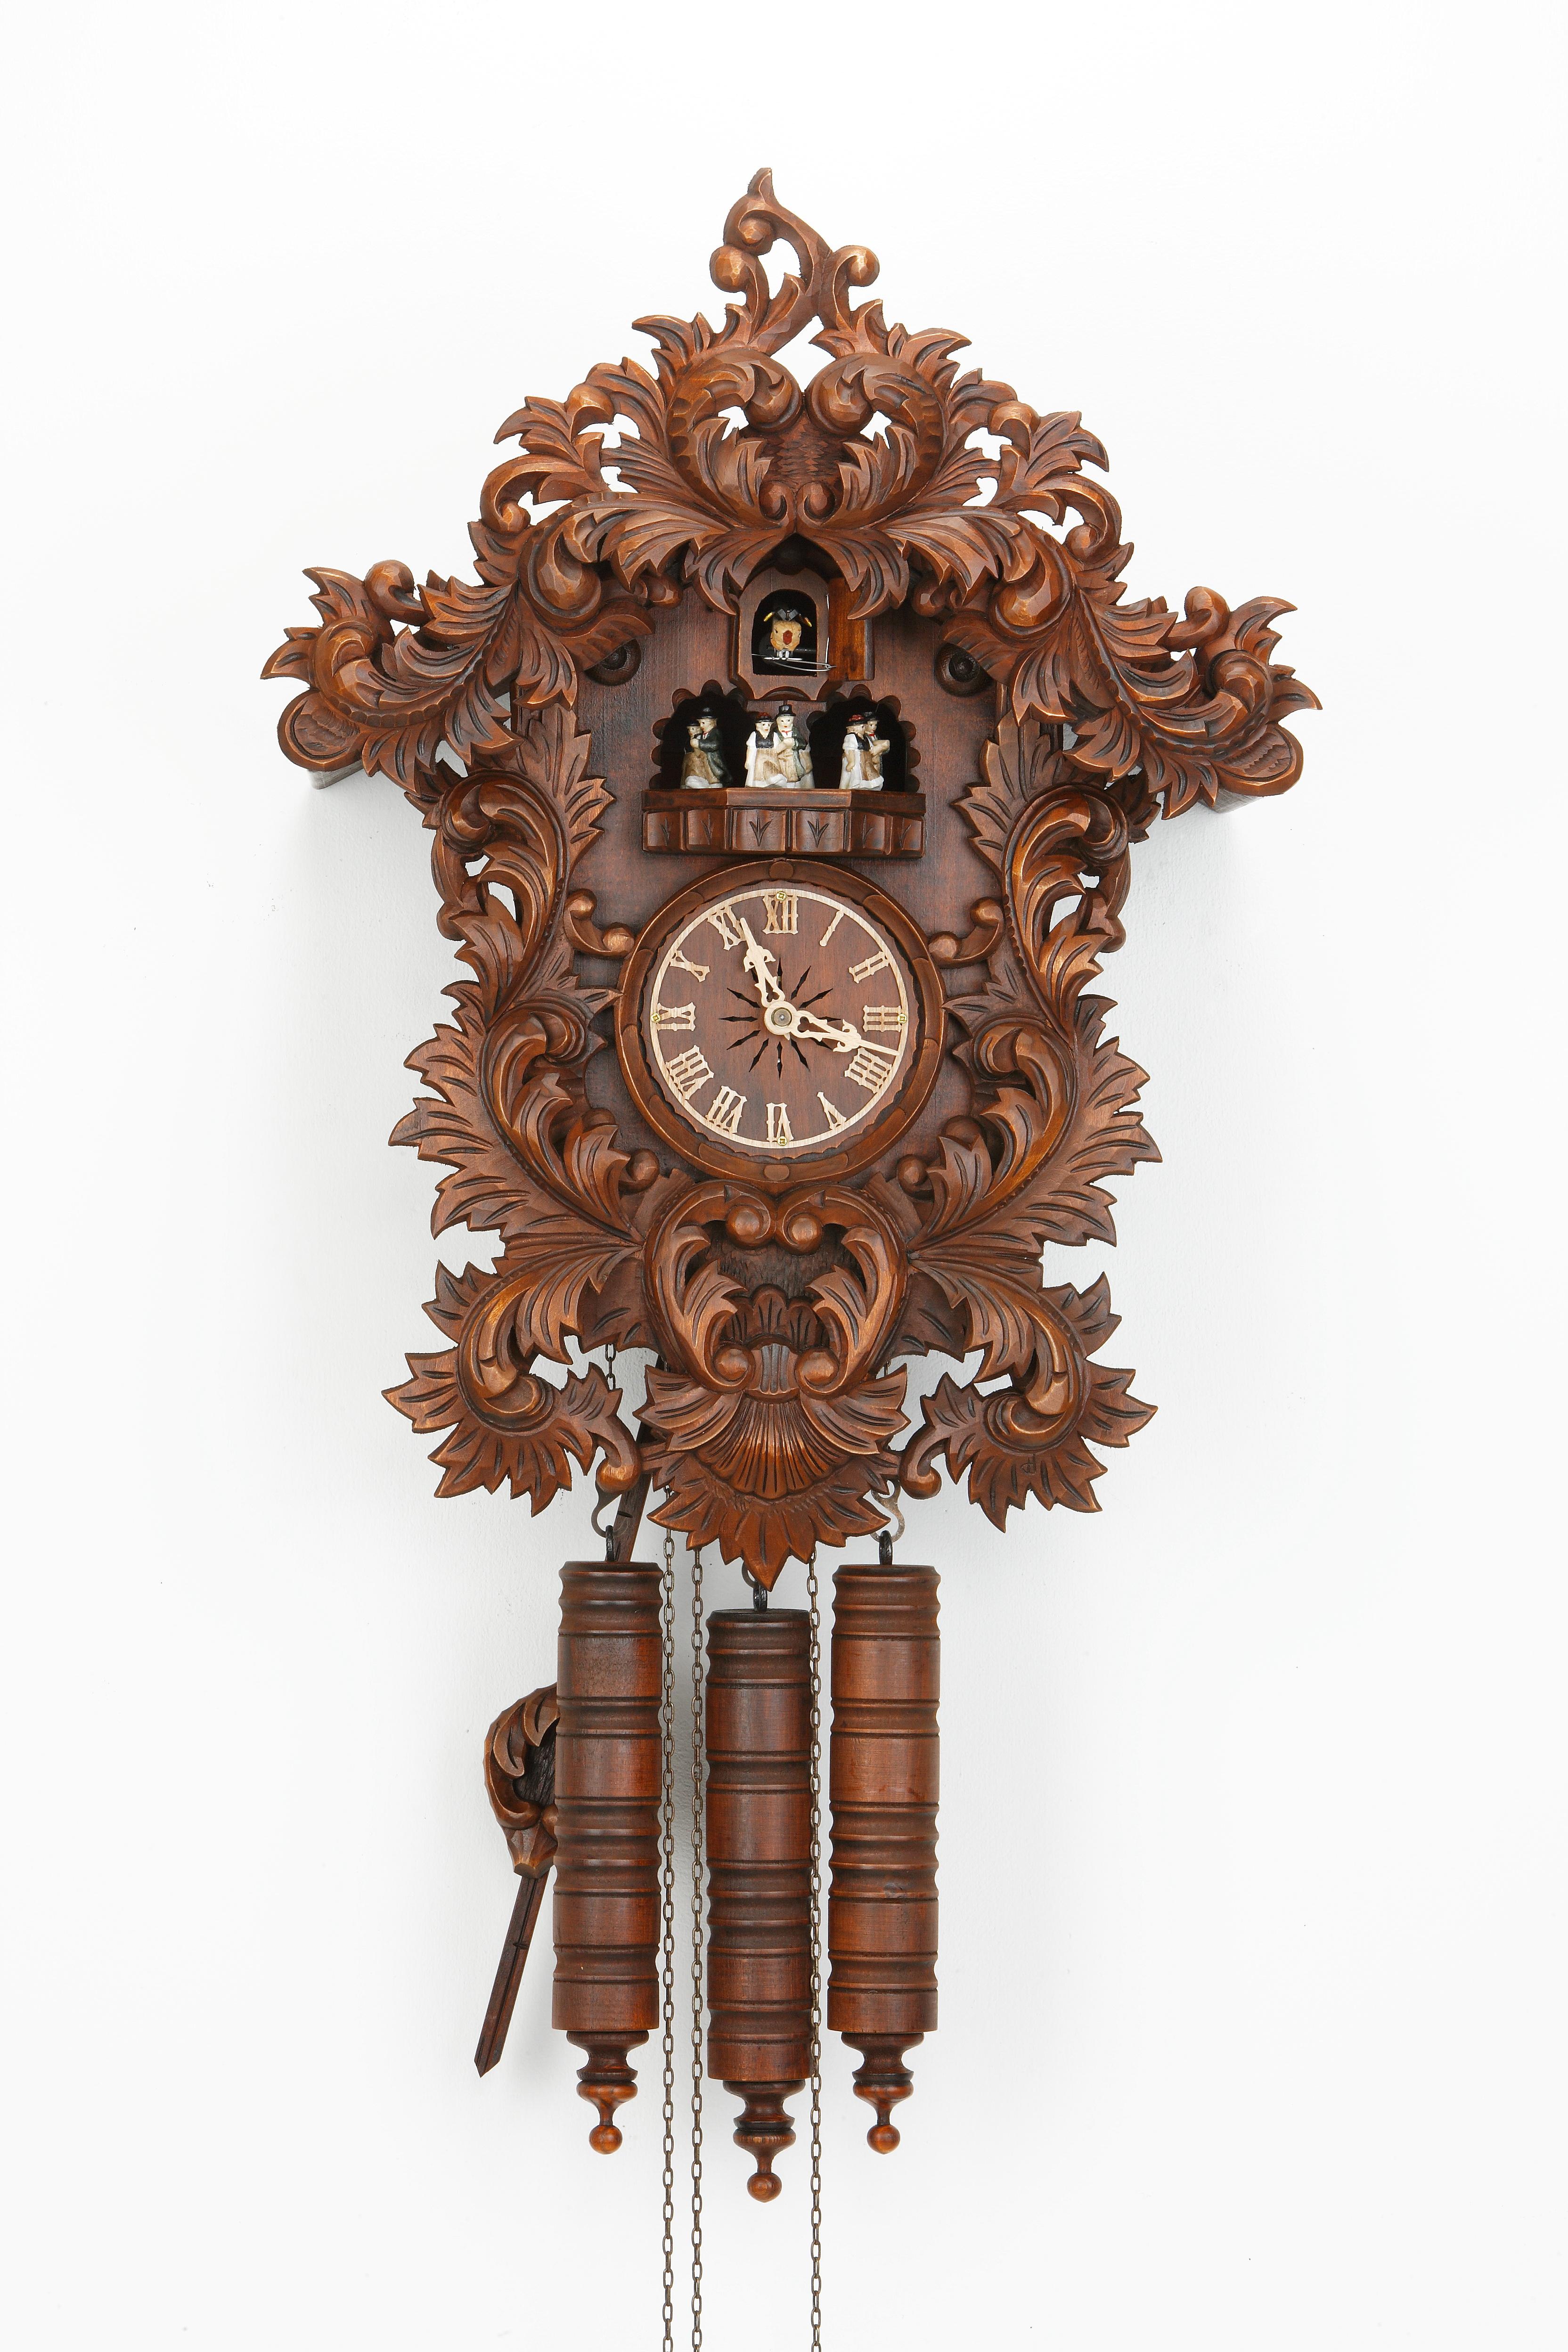 8 Days Music Dancer Cuckoo Clock Baroque Design